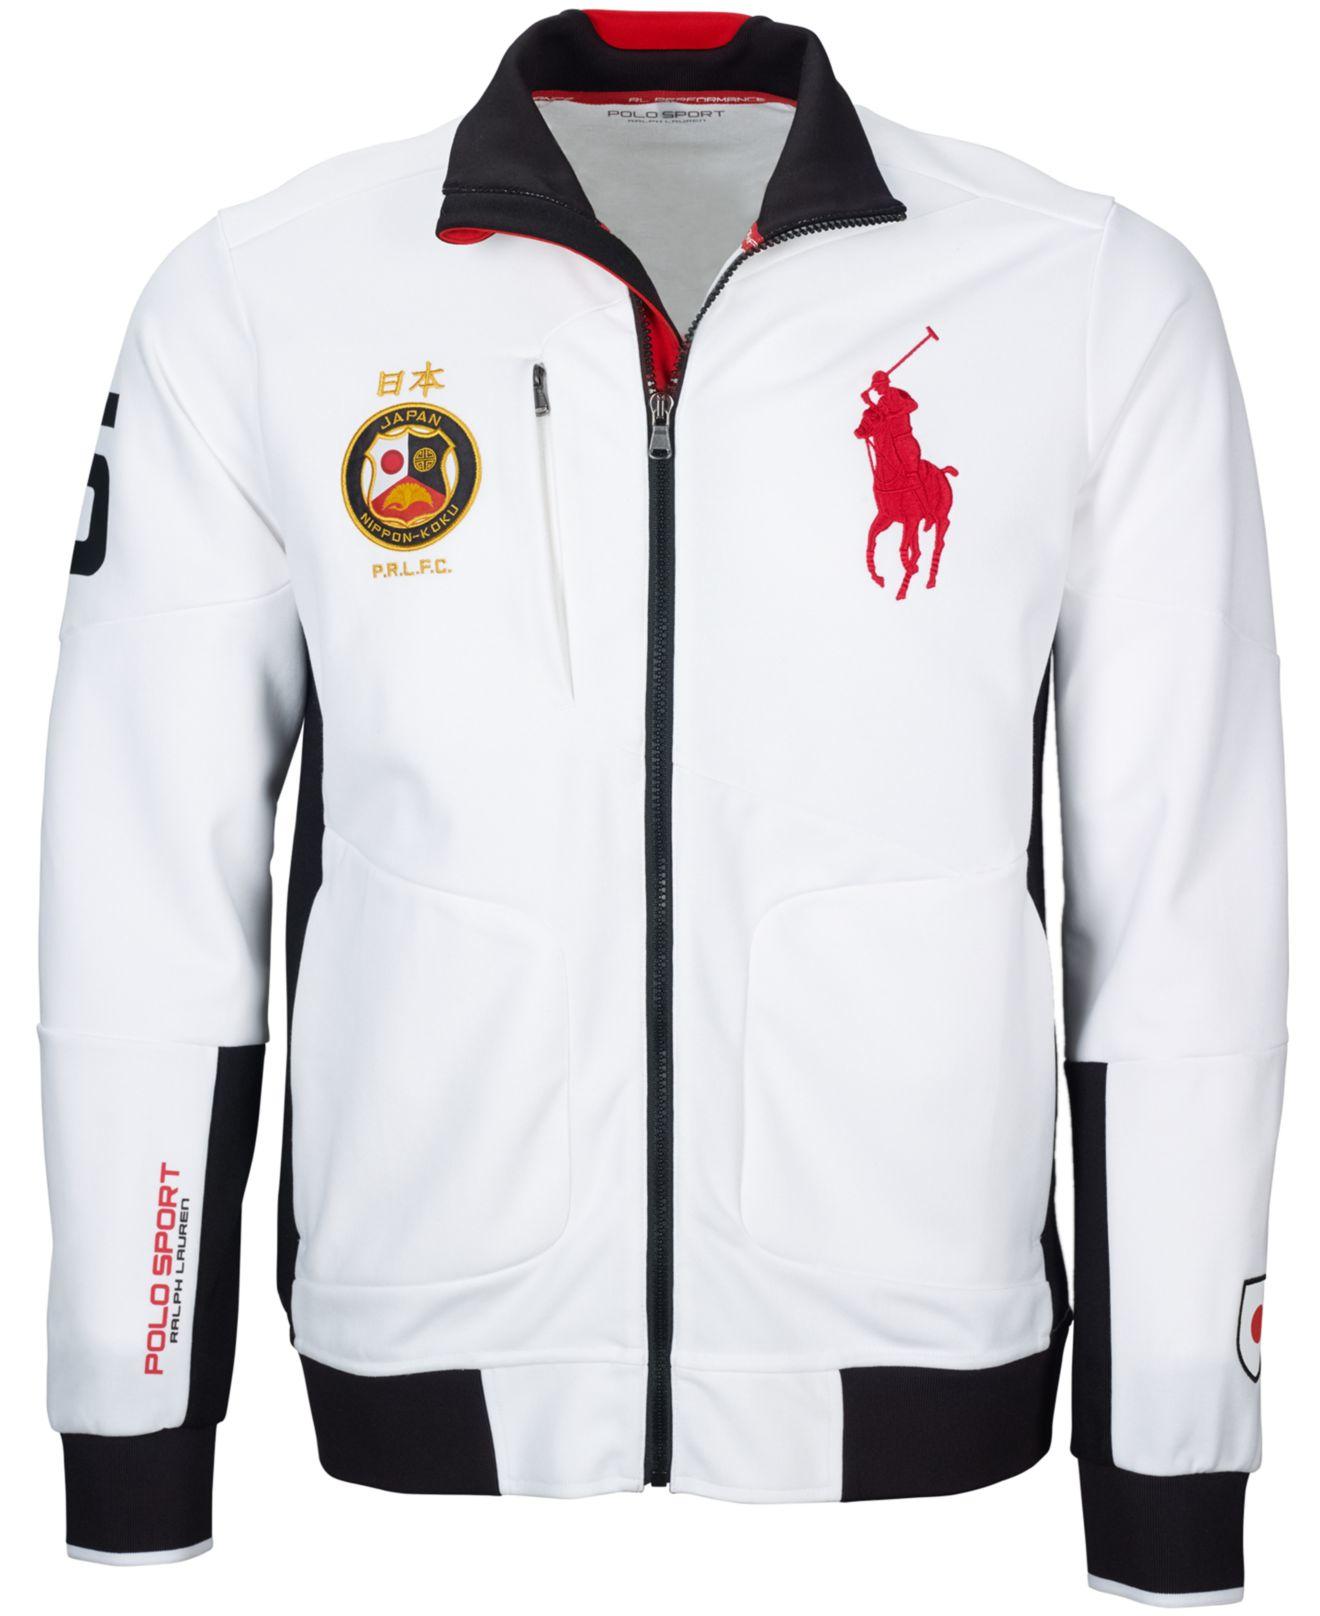 125f77323 Polo Ralph Lauren Polo Sport Japan Full-zip Track Jacket in White ...